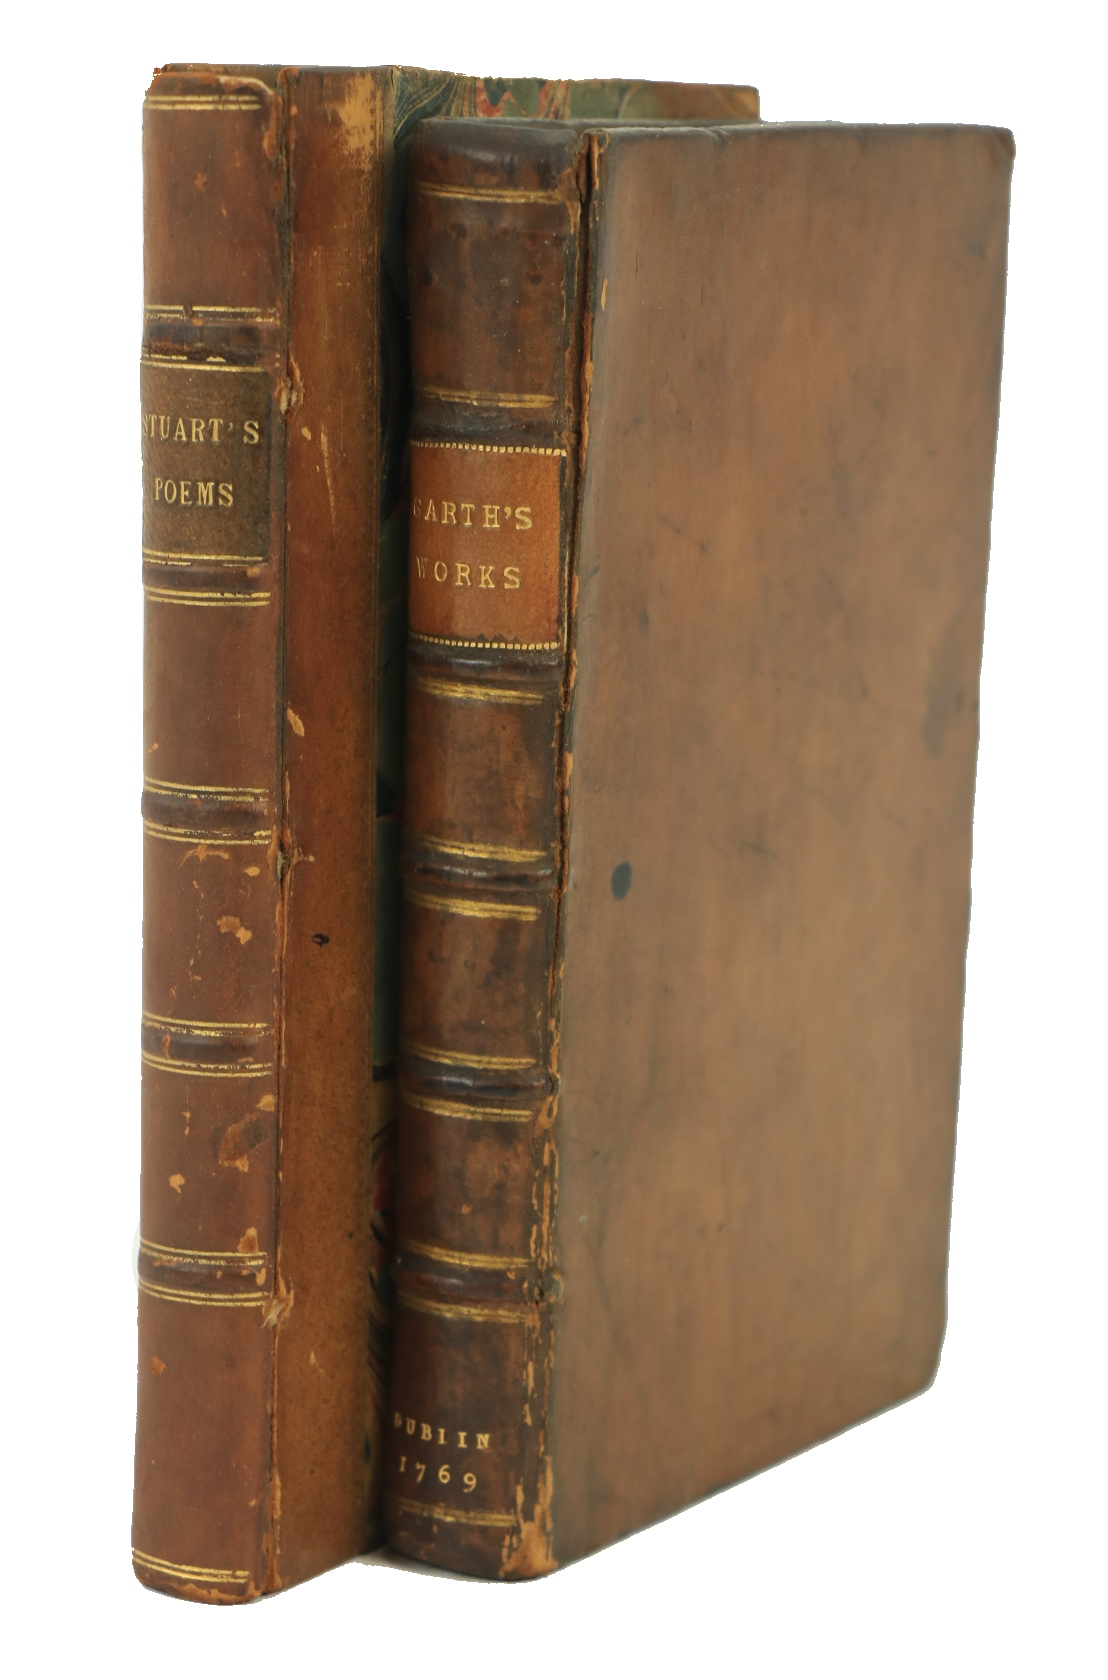 Irish Poetry:ÿ Garth (Sir Sam.)ÿThe Works of ..., 12mo D. (for Thomas Ewing) 1769.ÿFirst Edn., red &